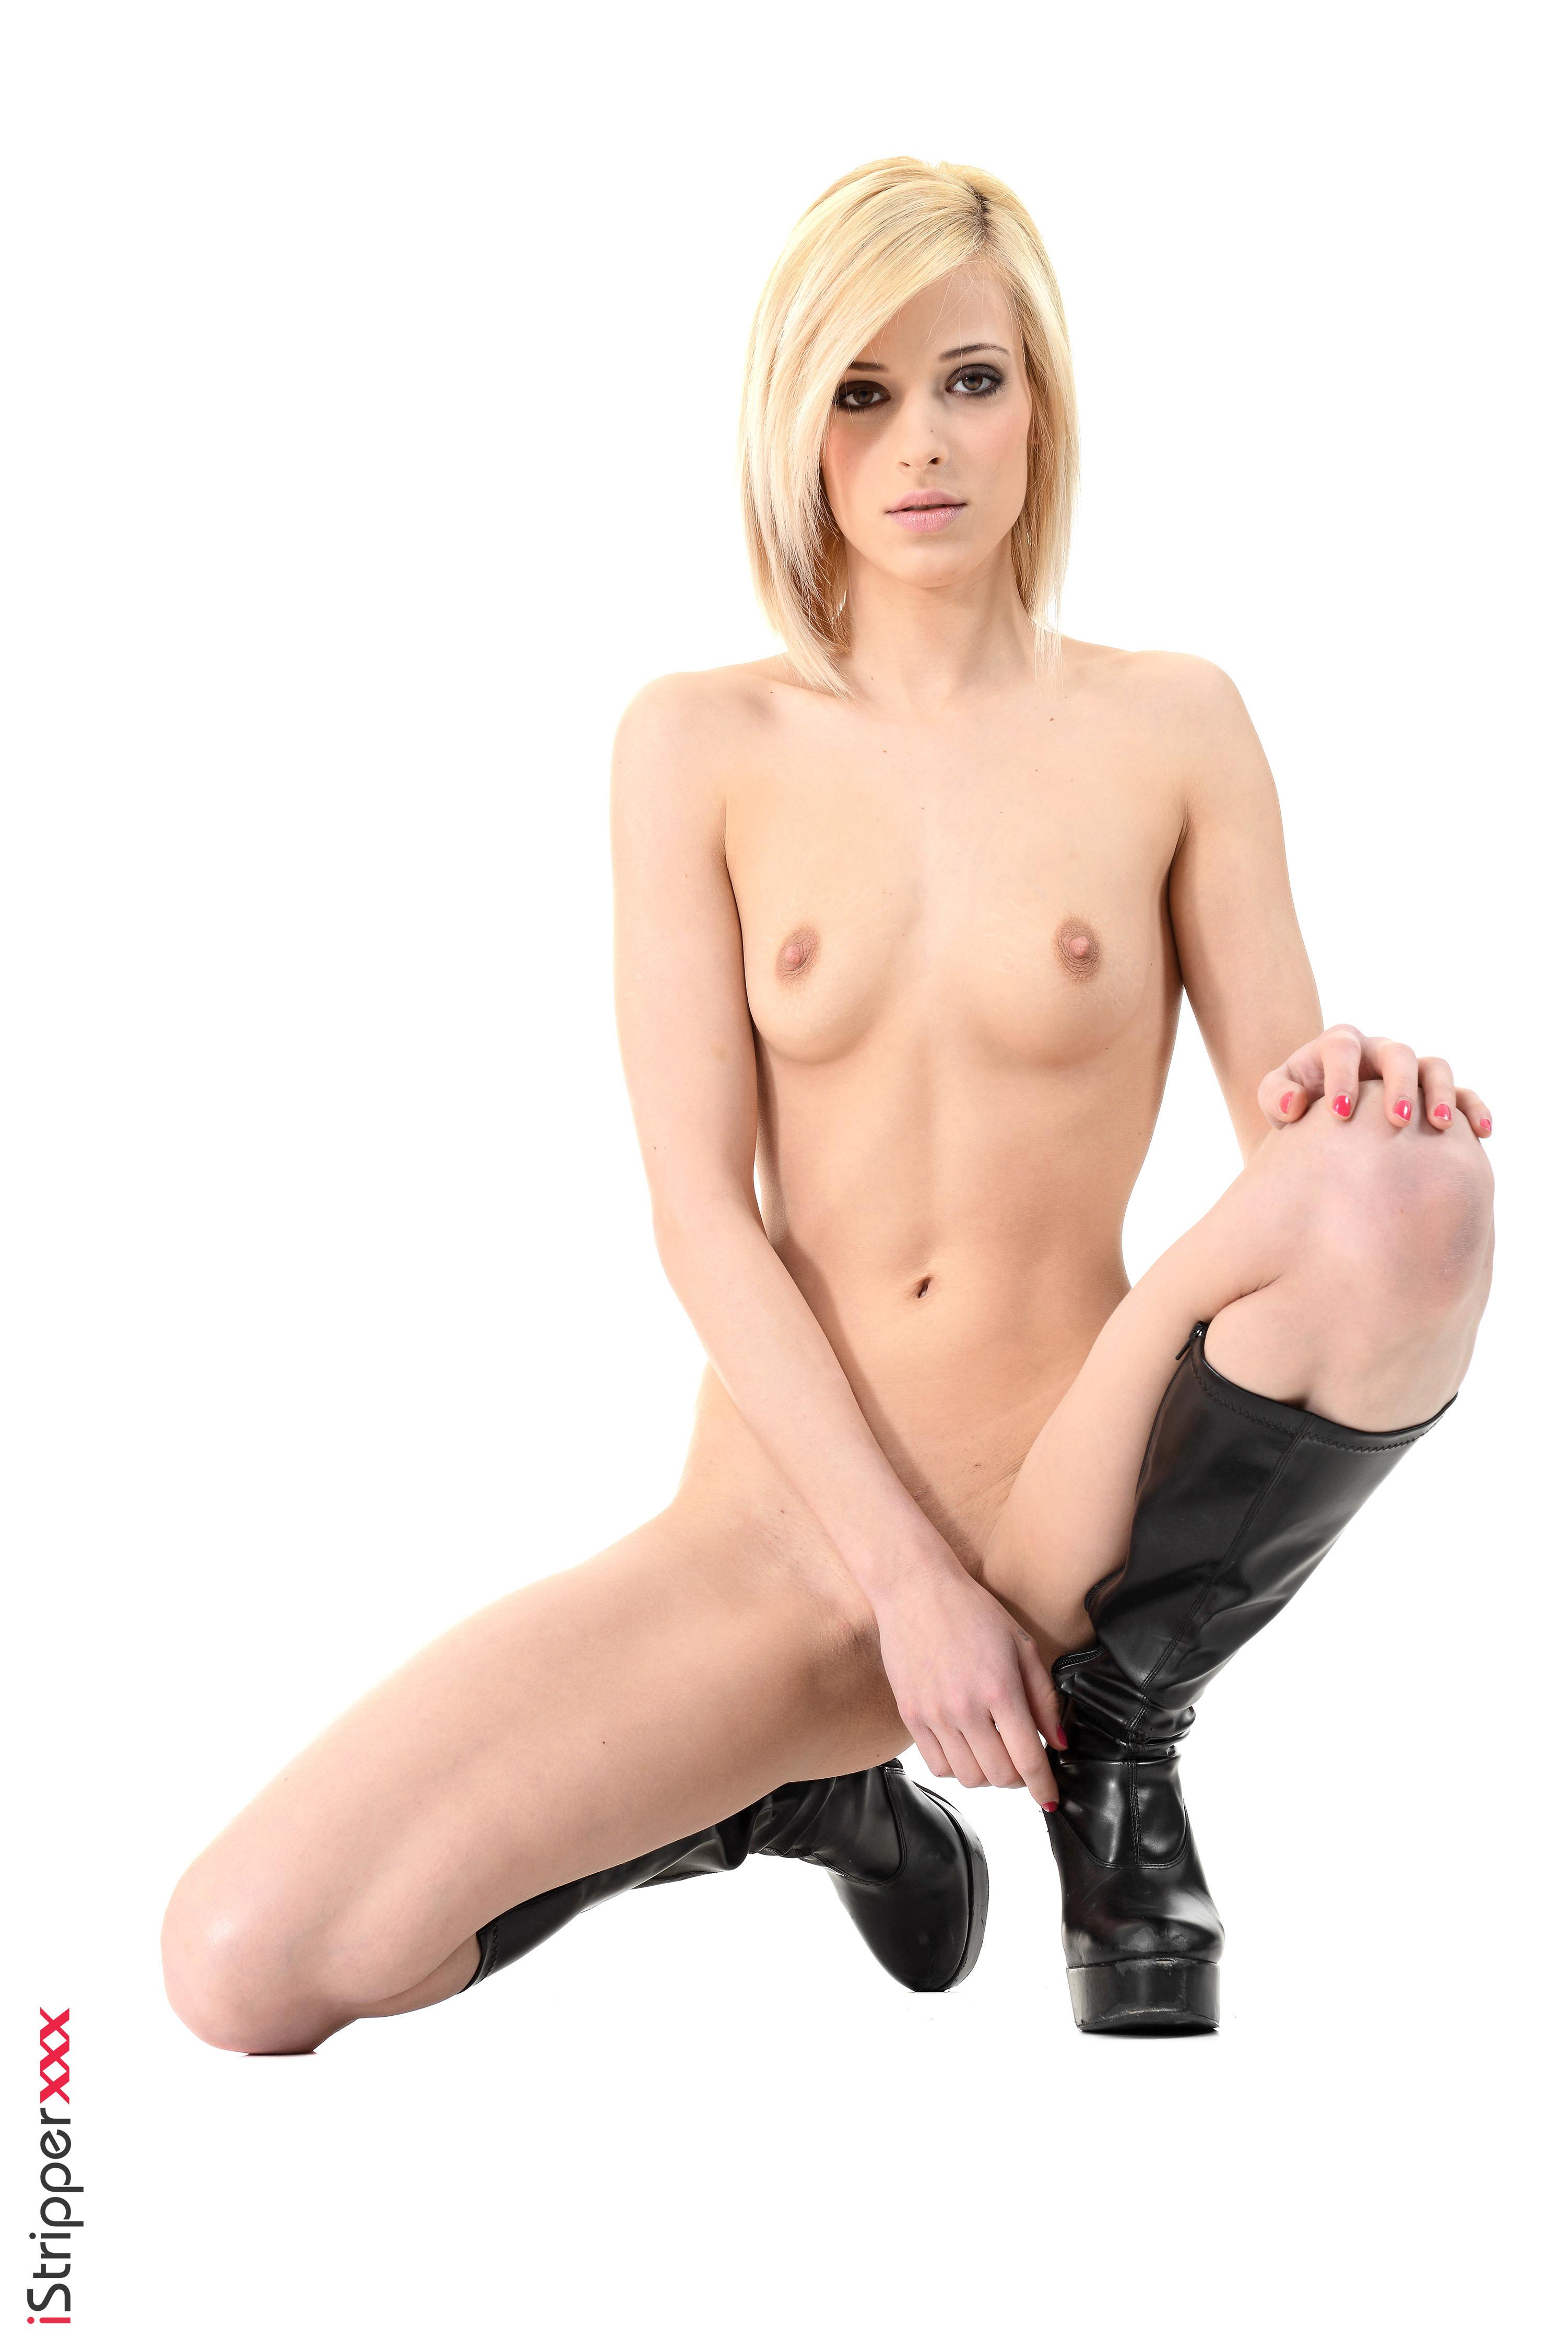 hot girl striptease sexy nude poledance desktop stripper sofia damon - scoreland